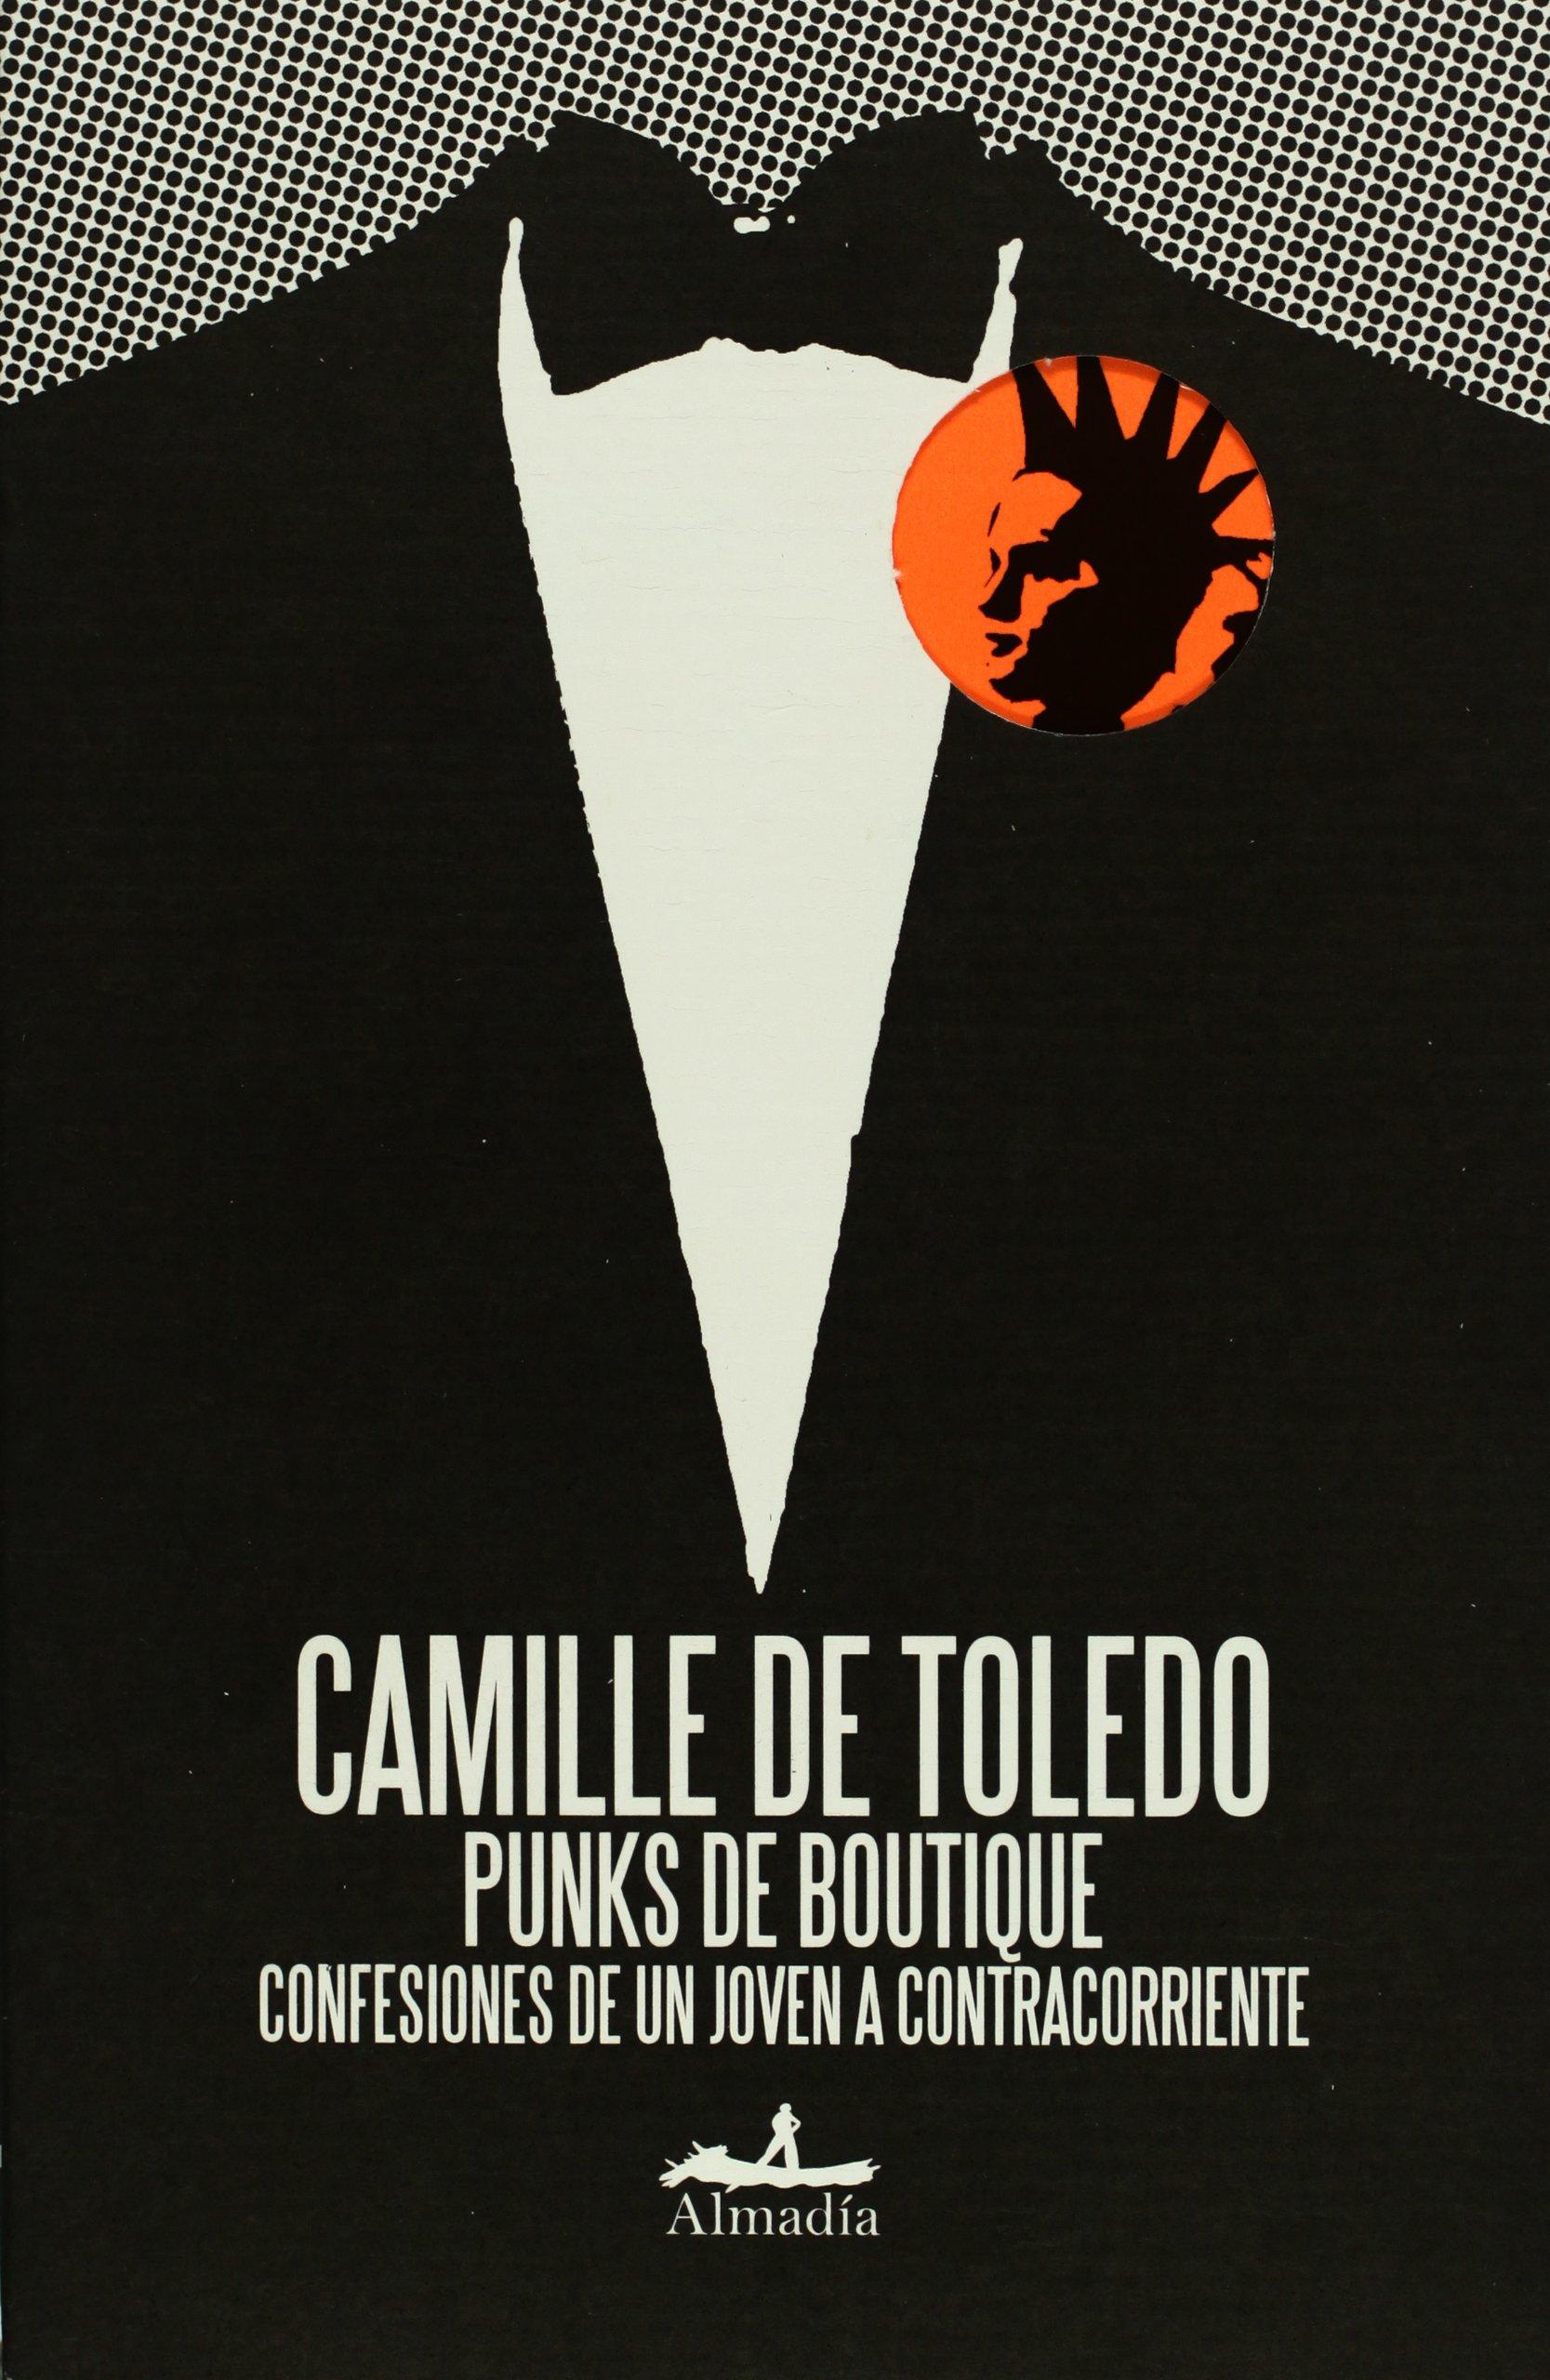 Download Punks de boutique, confesiones de un joven a contracorriente (Spanish Edition) PDF